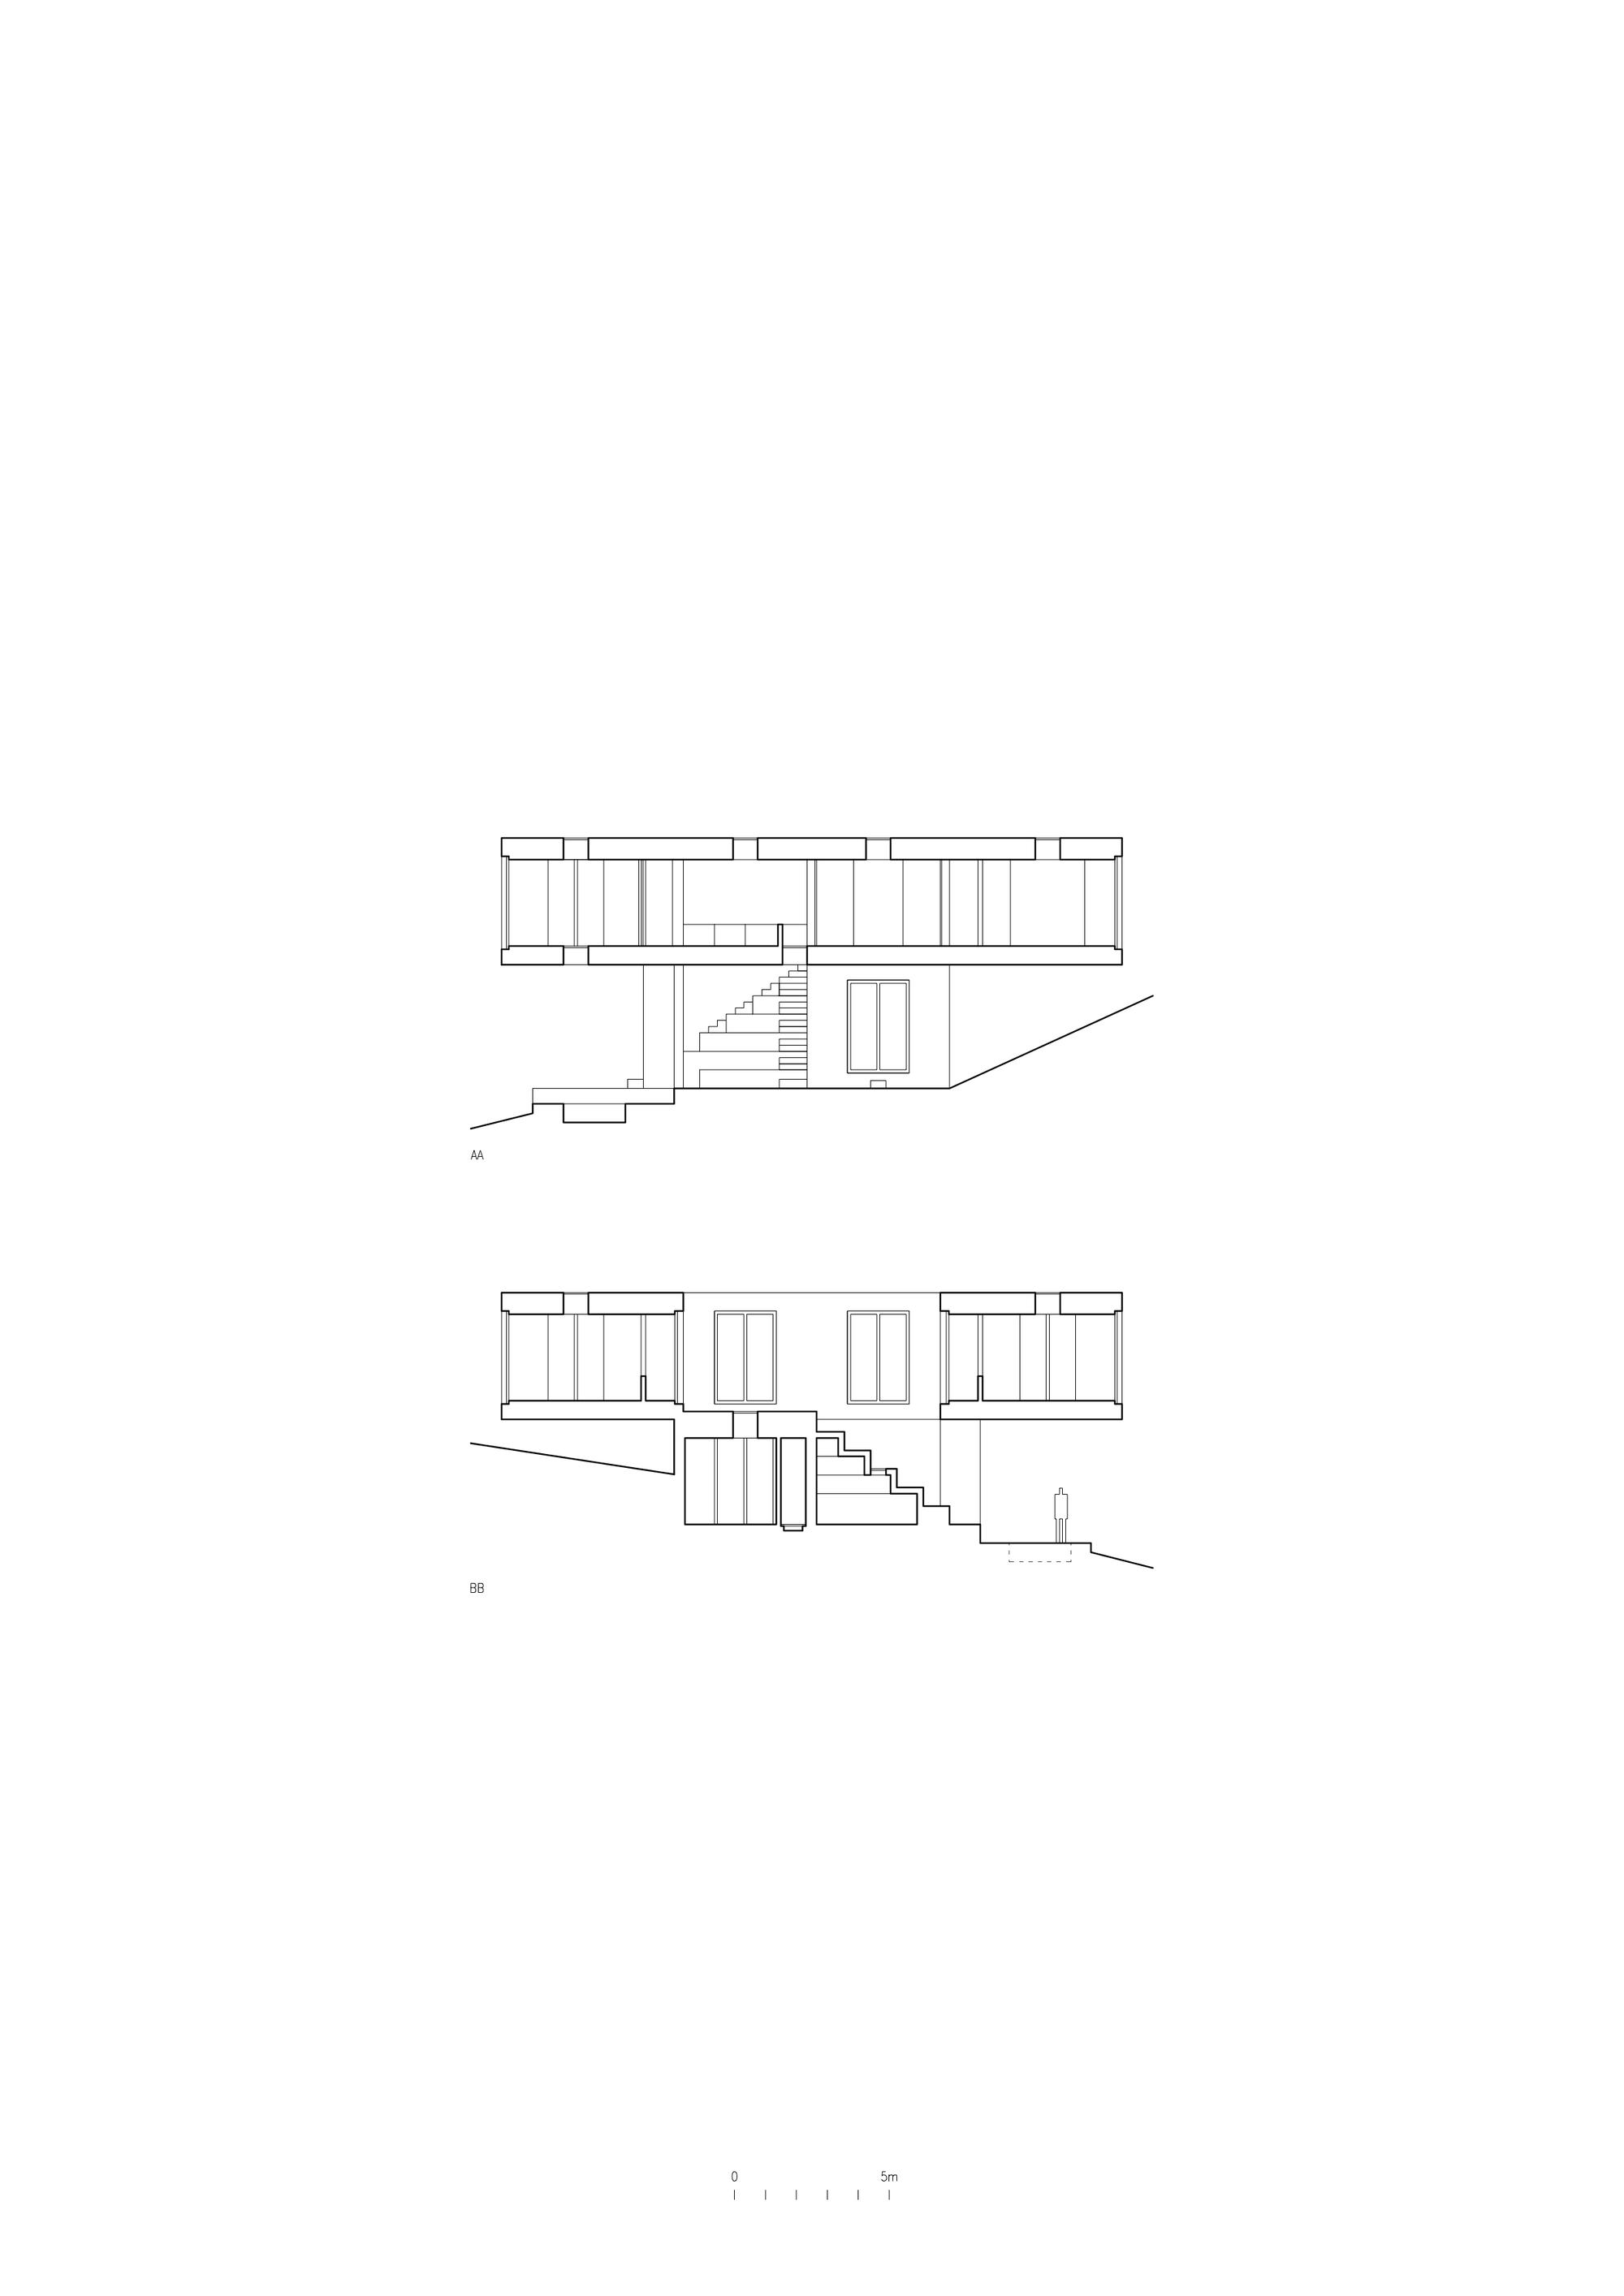 54aaf756e58eceffe50000bb_guna-house-pezo-von-ellrichshausen_pve_guna_06_sections1